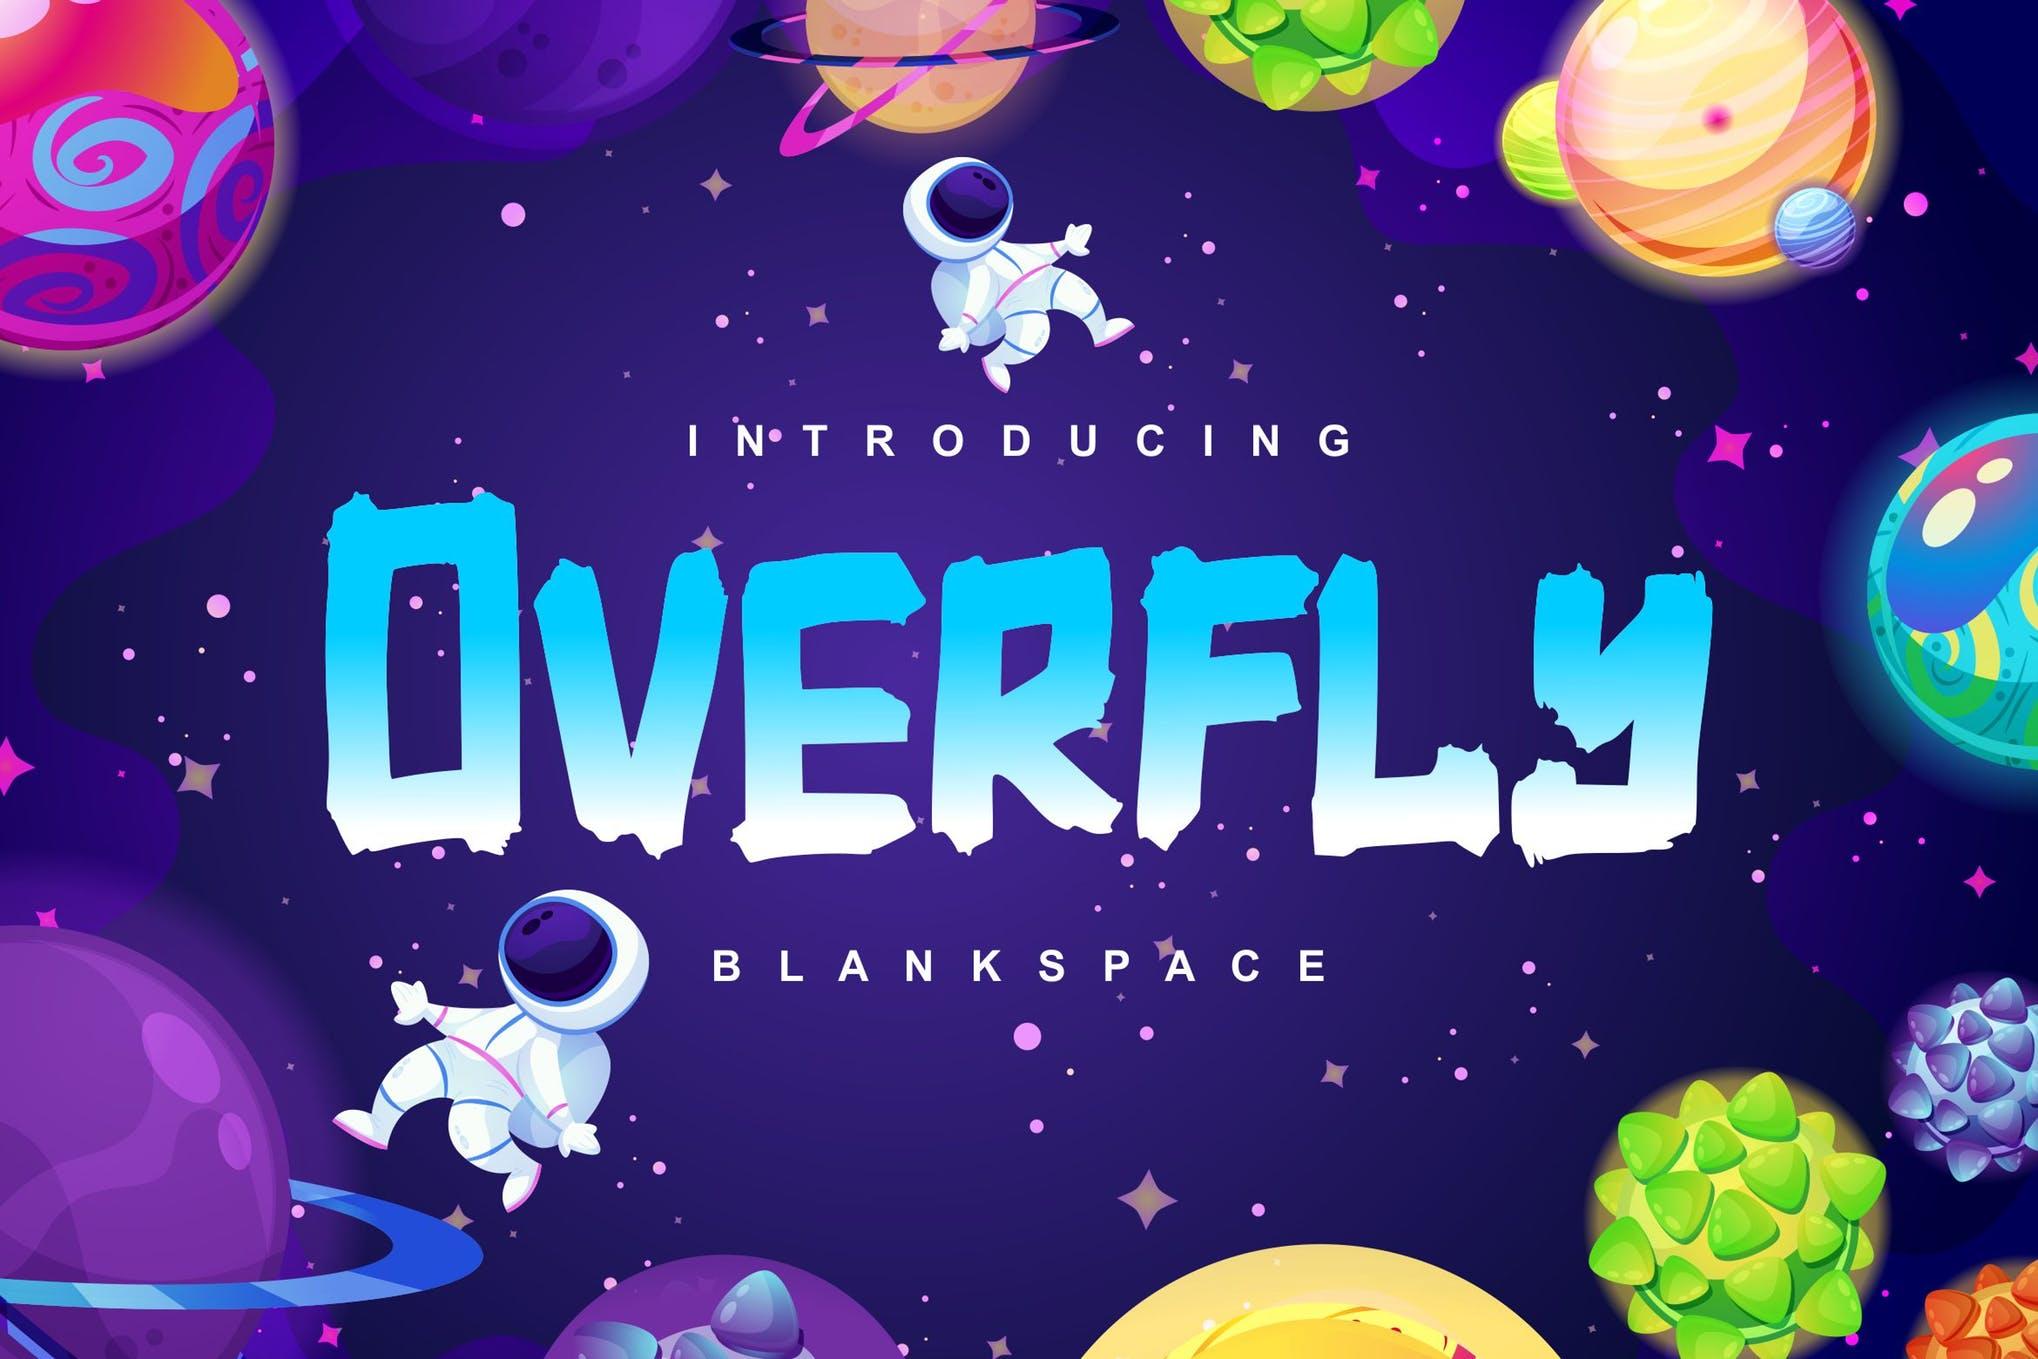 دانلود اسکریپت فونت فضایی و خاص Overfly